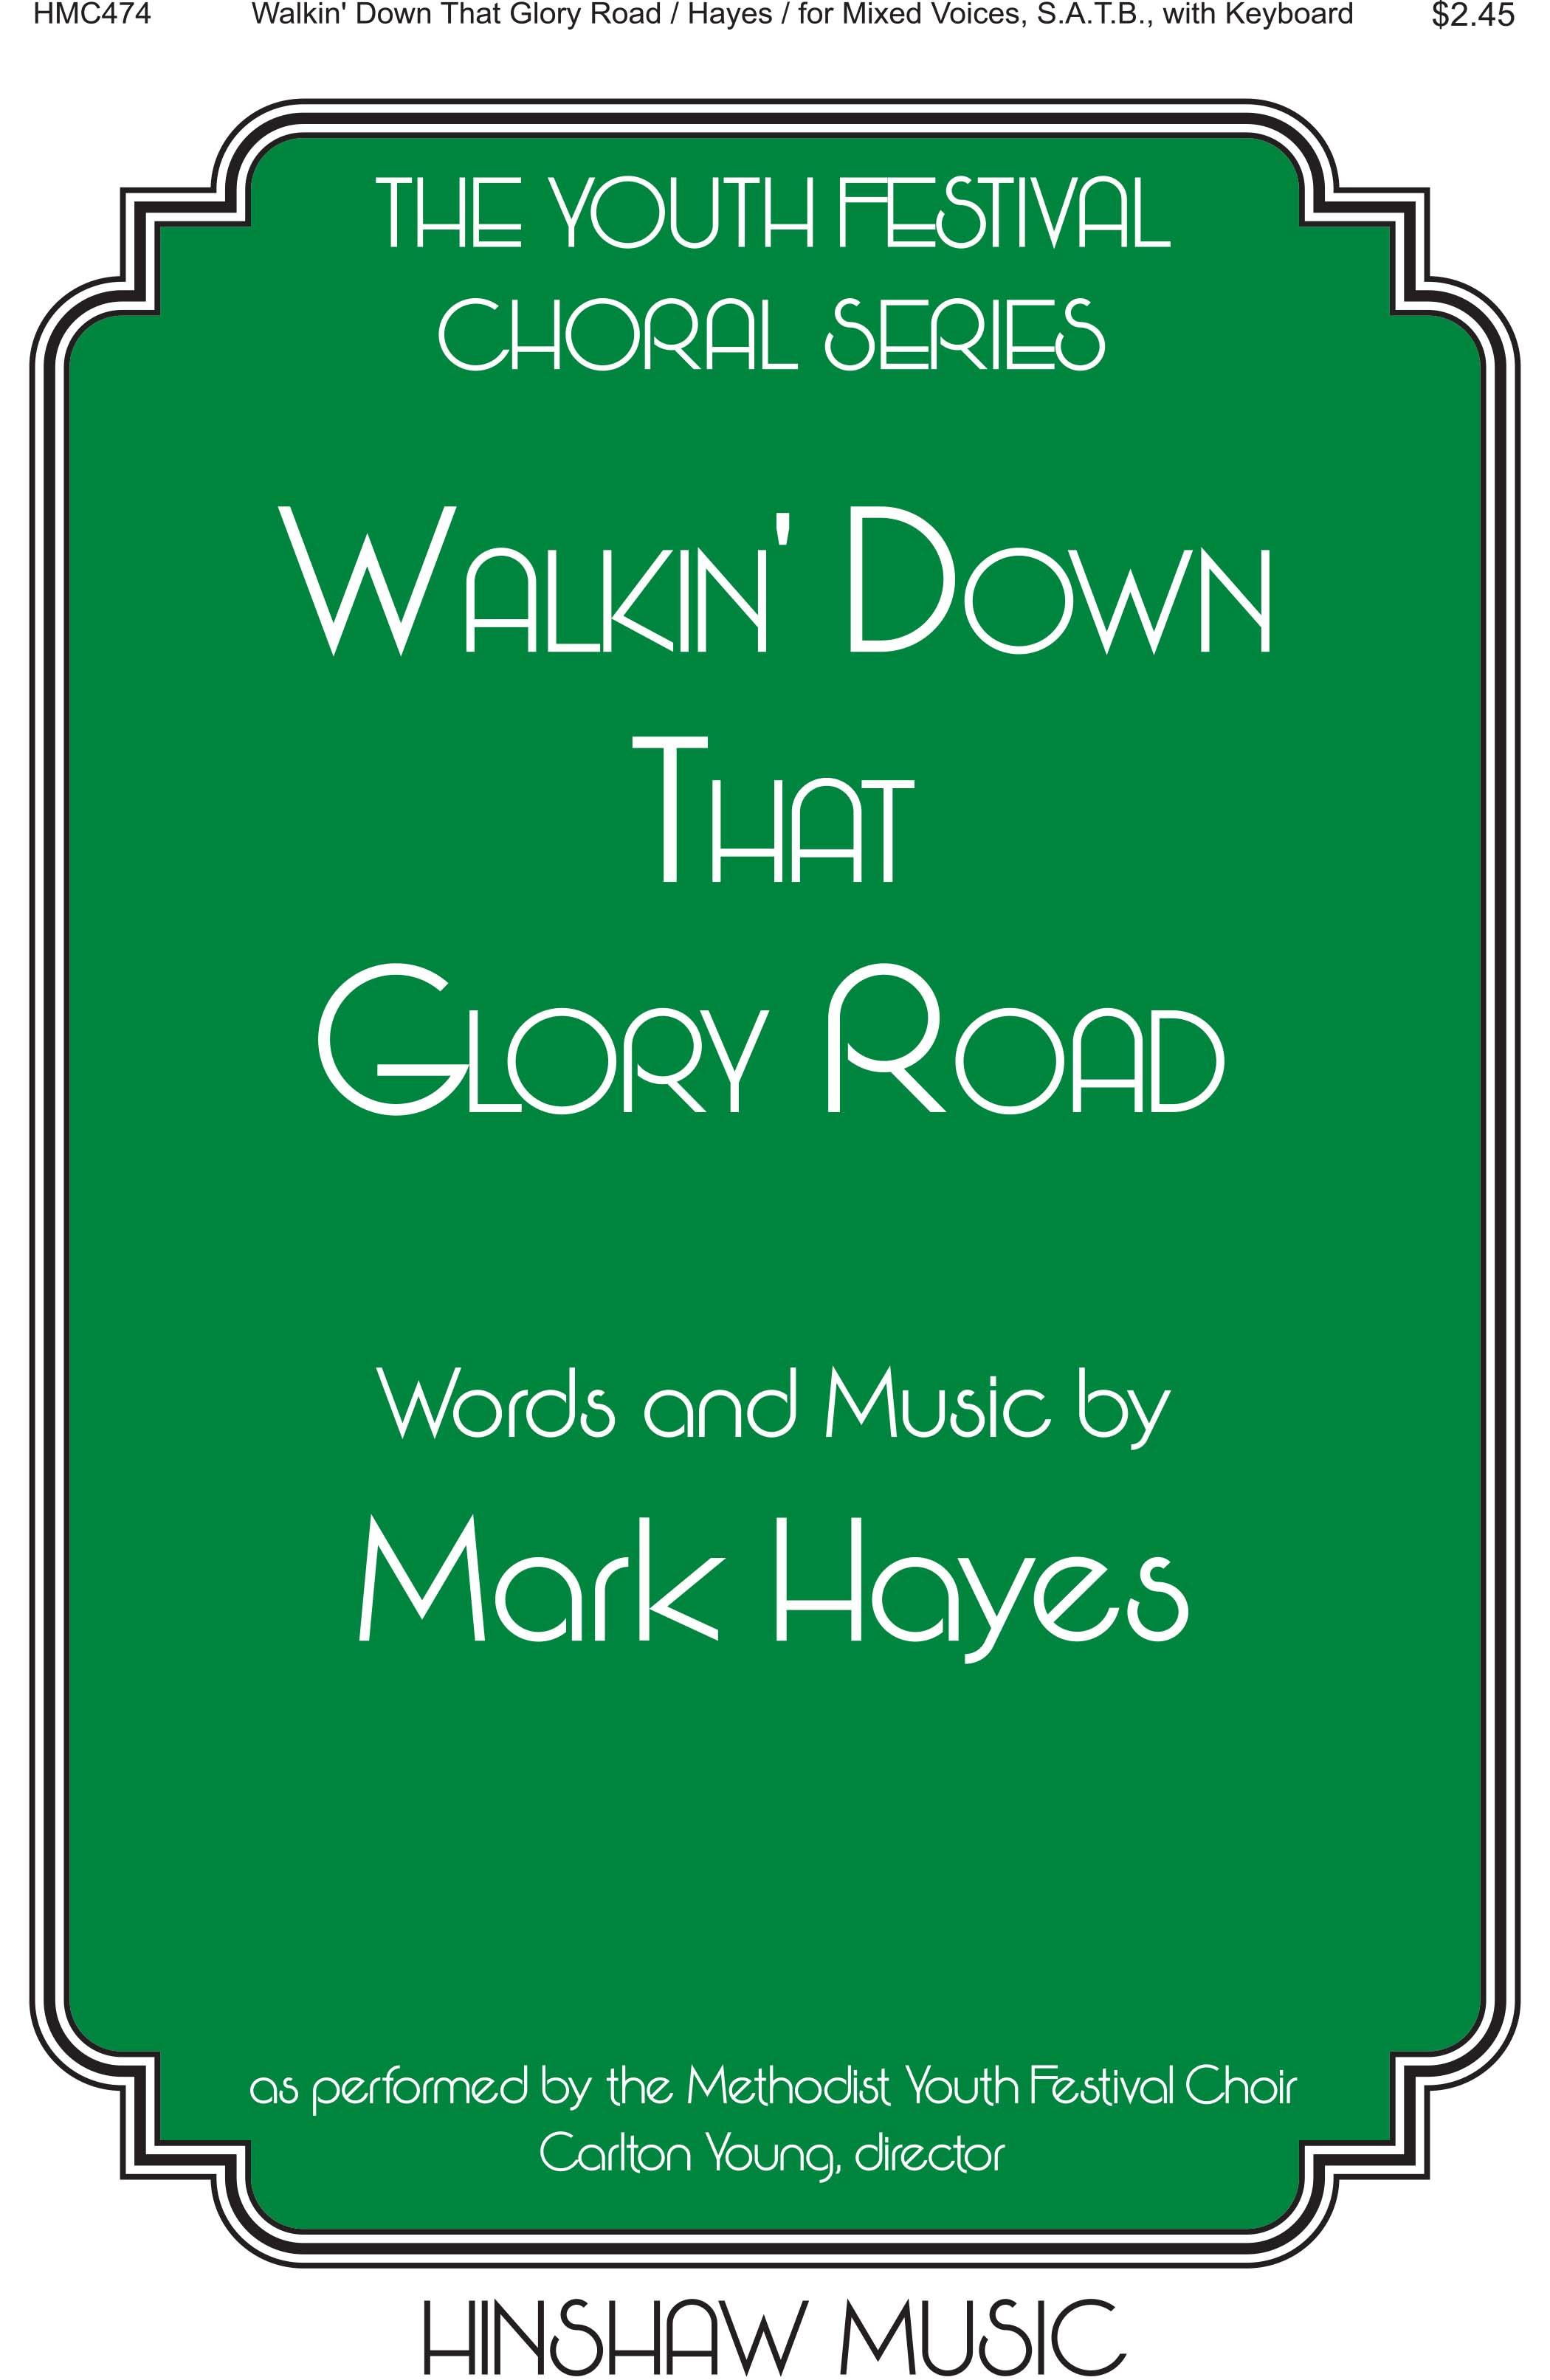 Walkin' Down That Glory Road